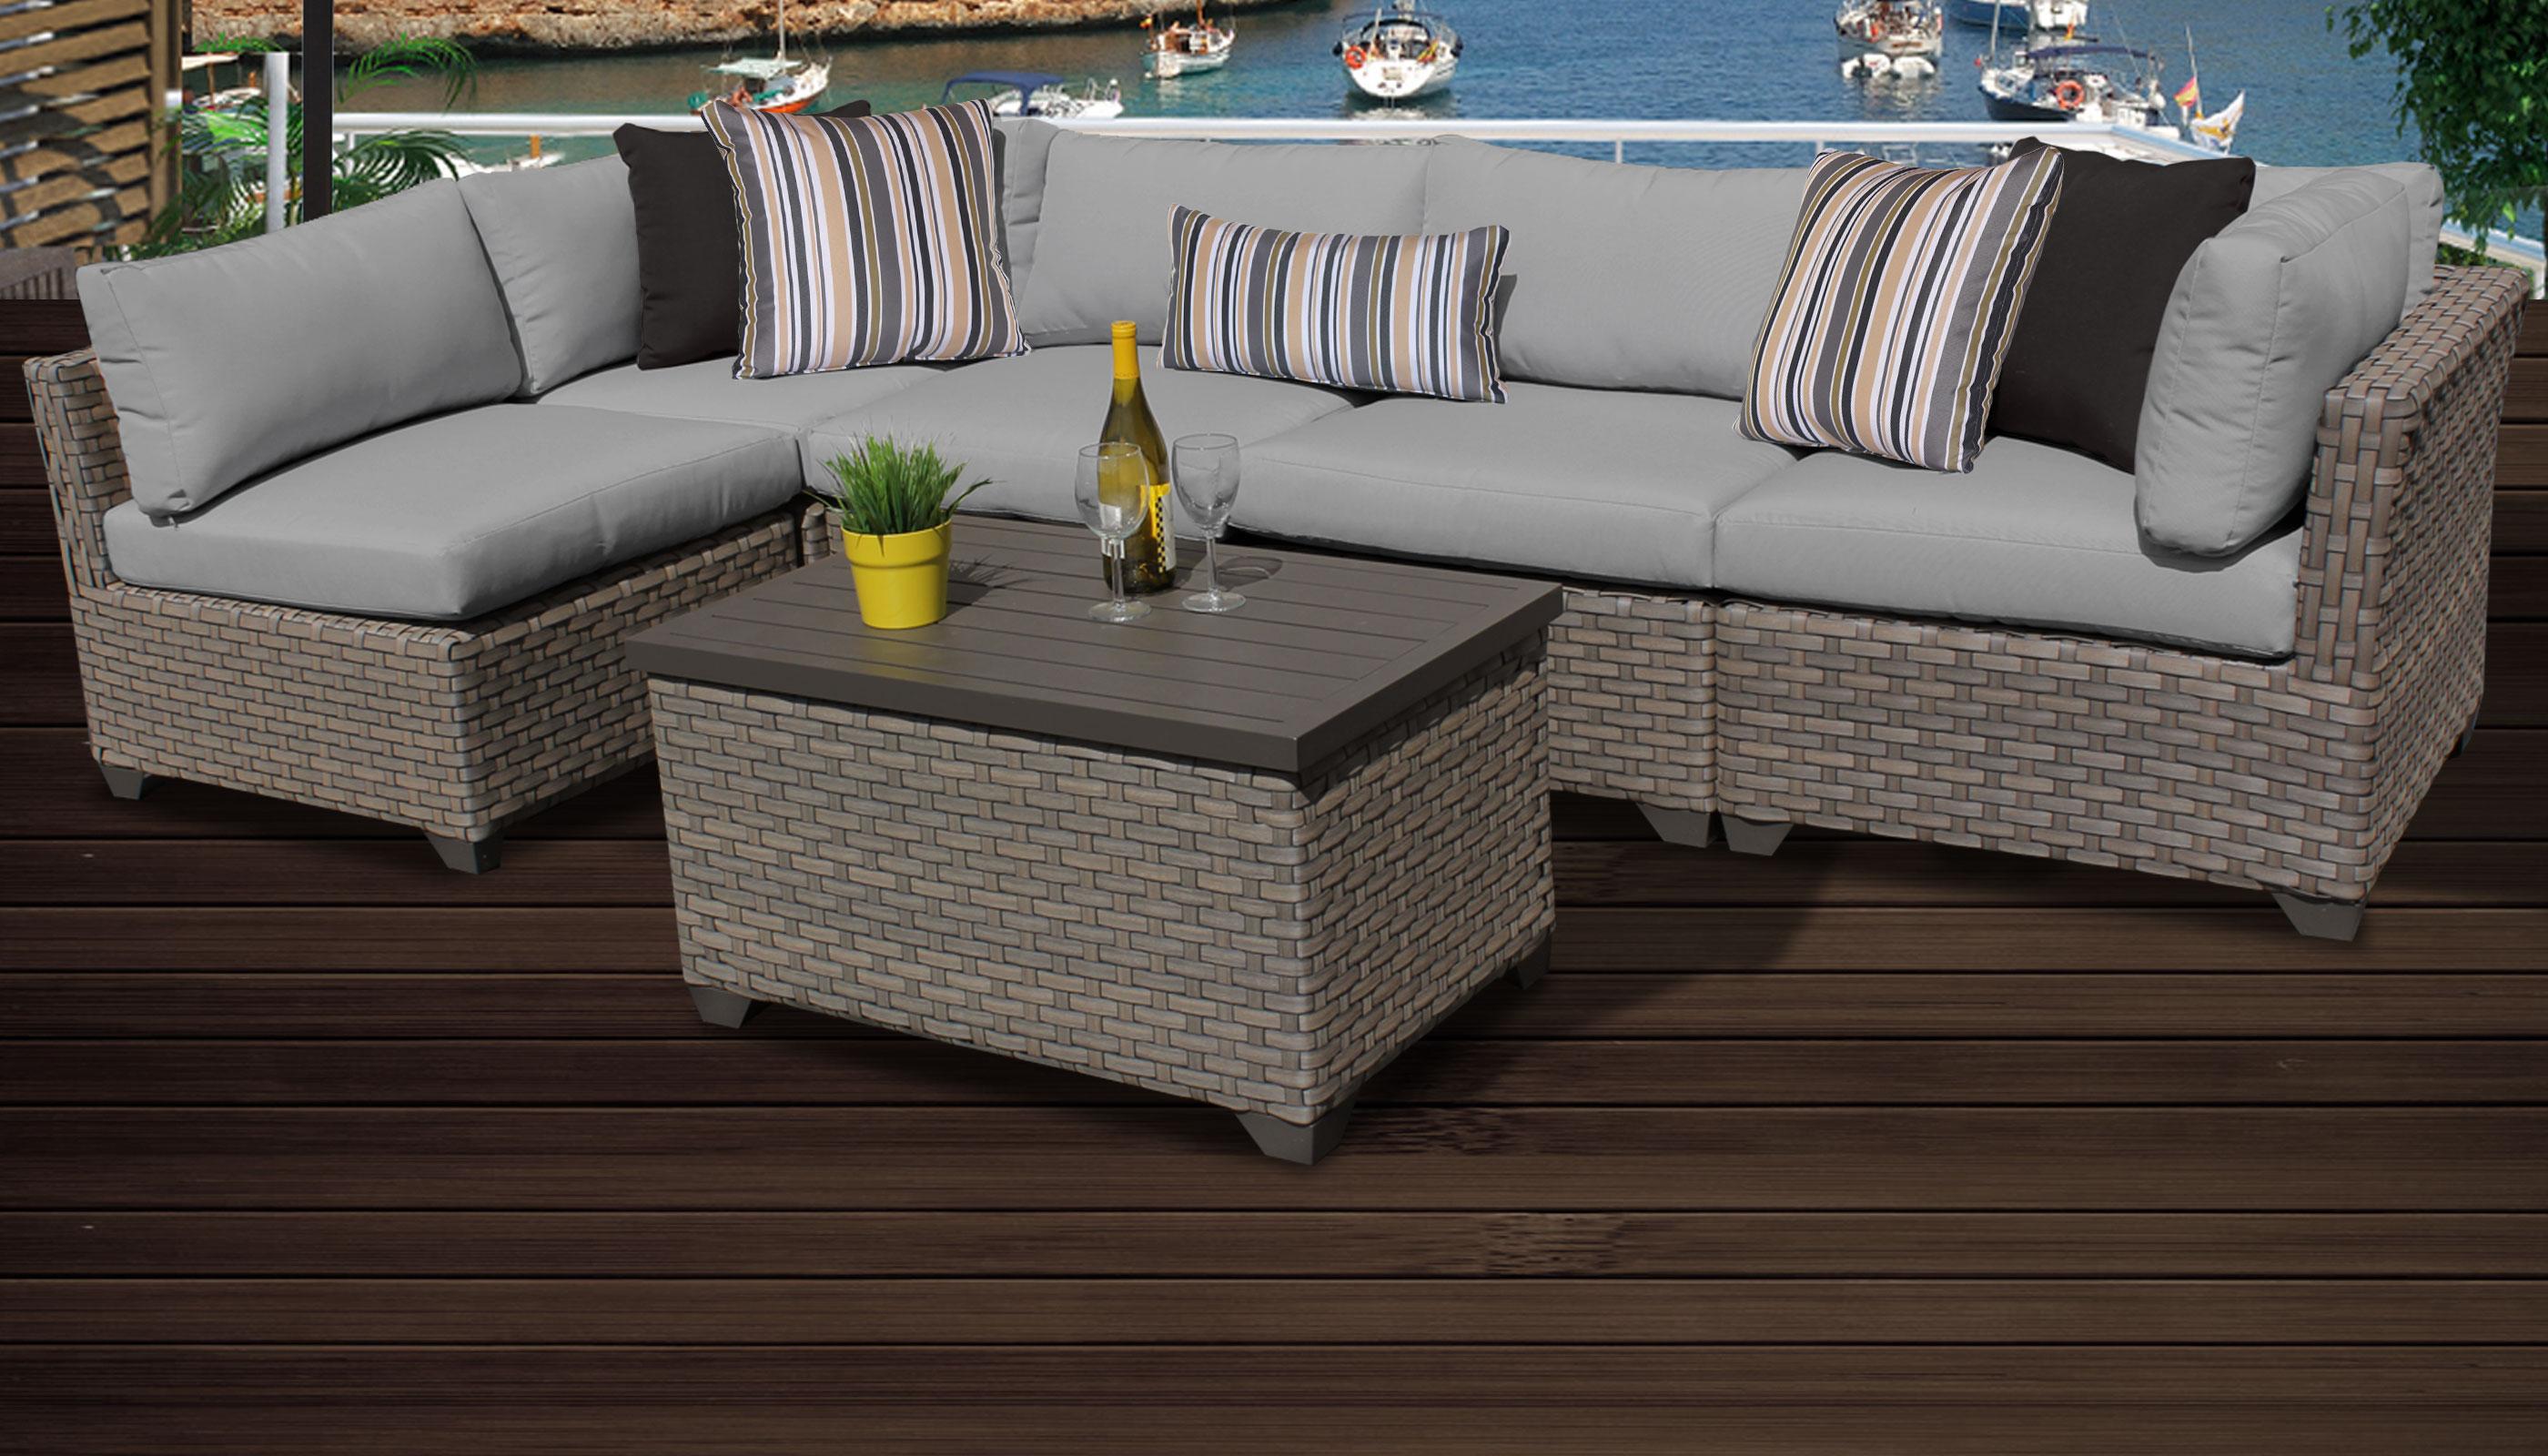 Monterey 6 Piece Outdoor Wicker Patio Furniture Set 06a